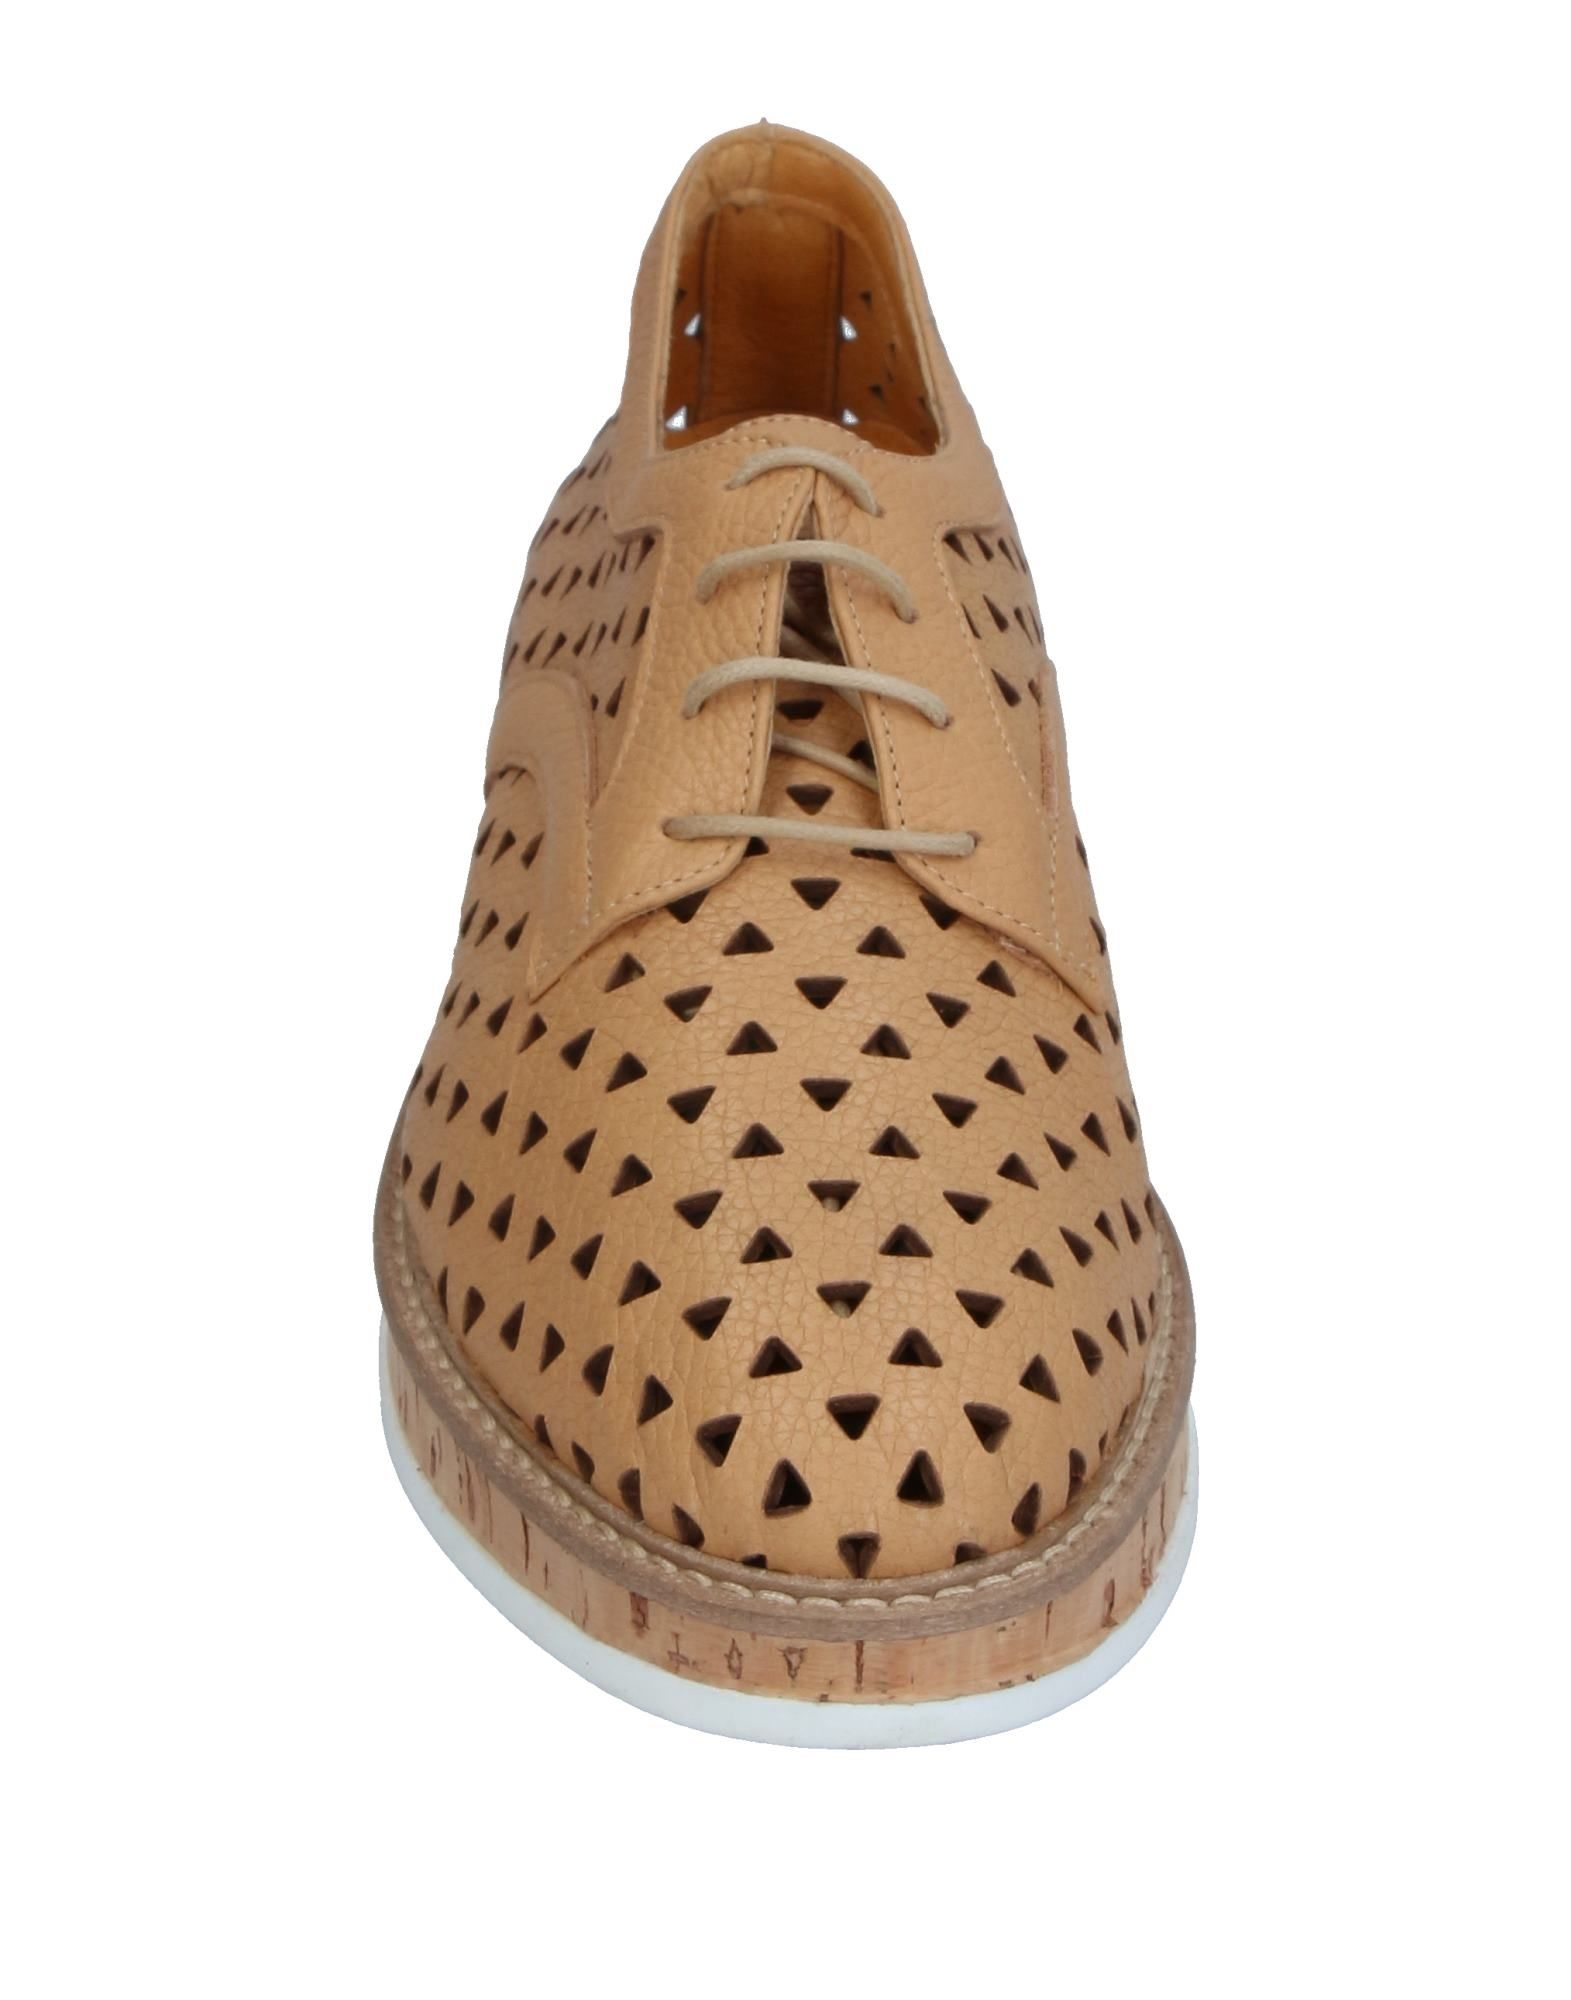 Paola Ferri Schnürschuhe Qualität Damen  11375540ME Gute Qualität Schnürschuhe beliebte Schuhe 7cfb83